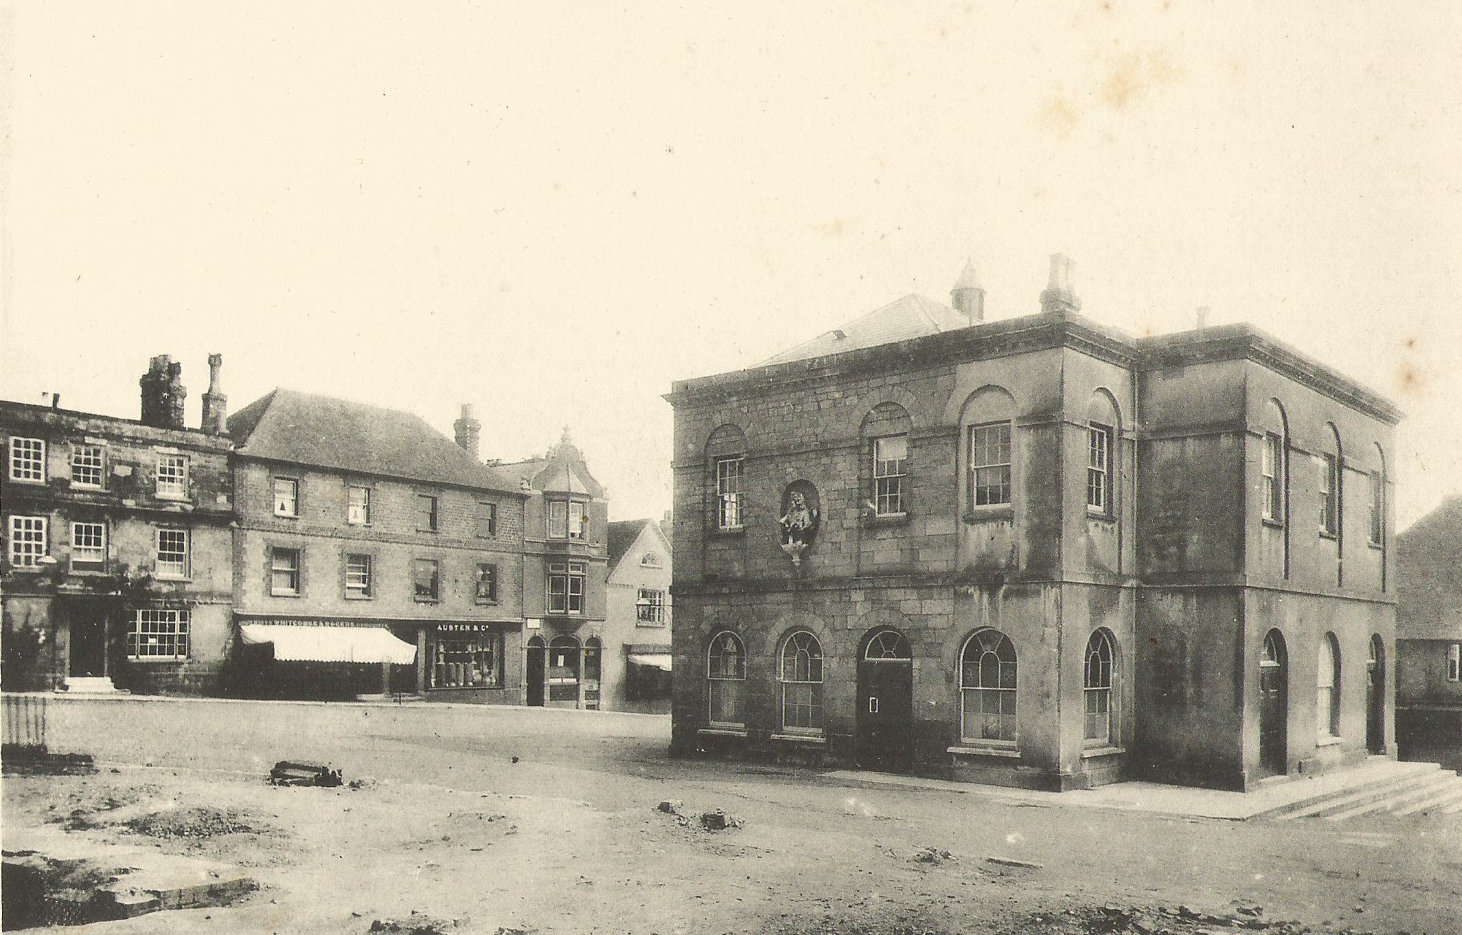 Leconfield Hall